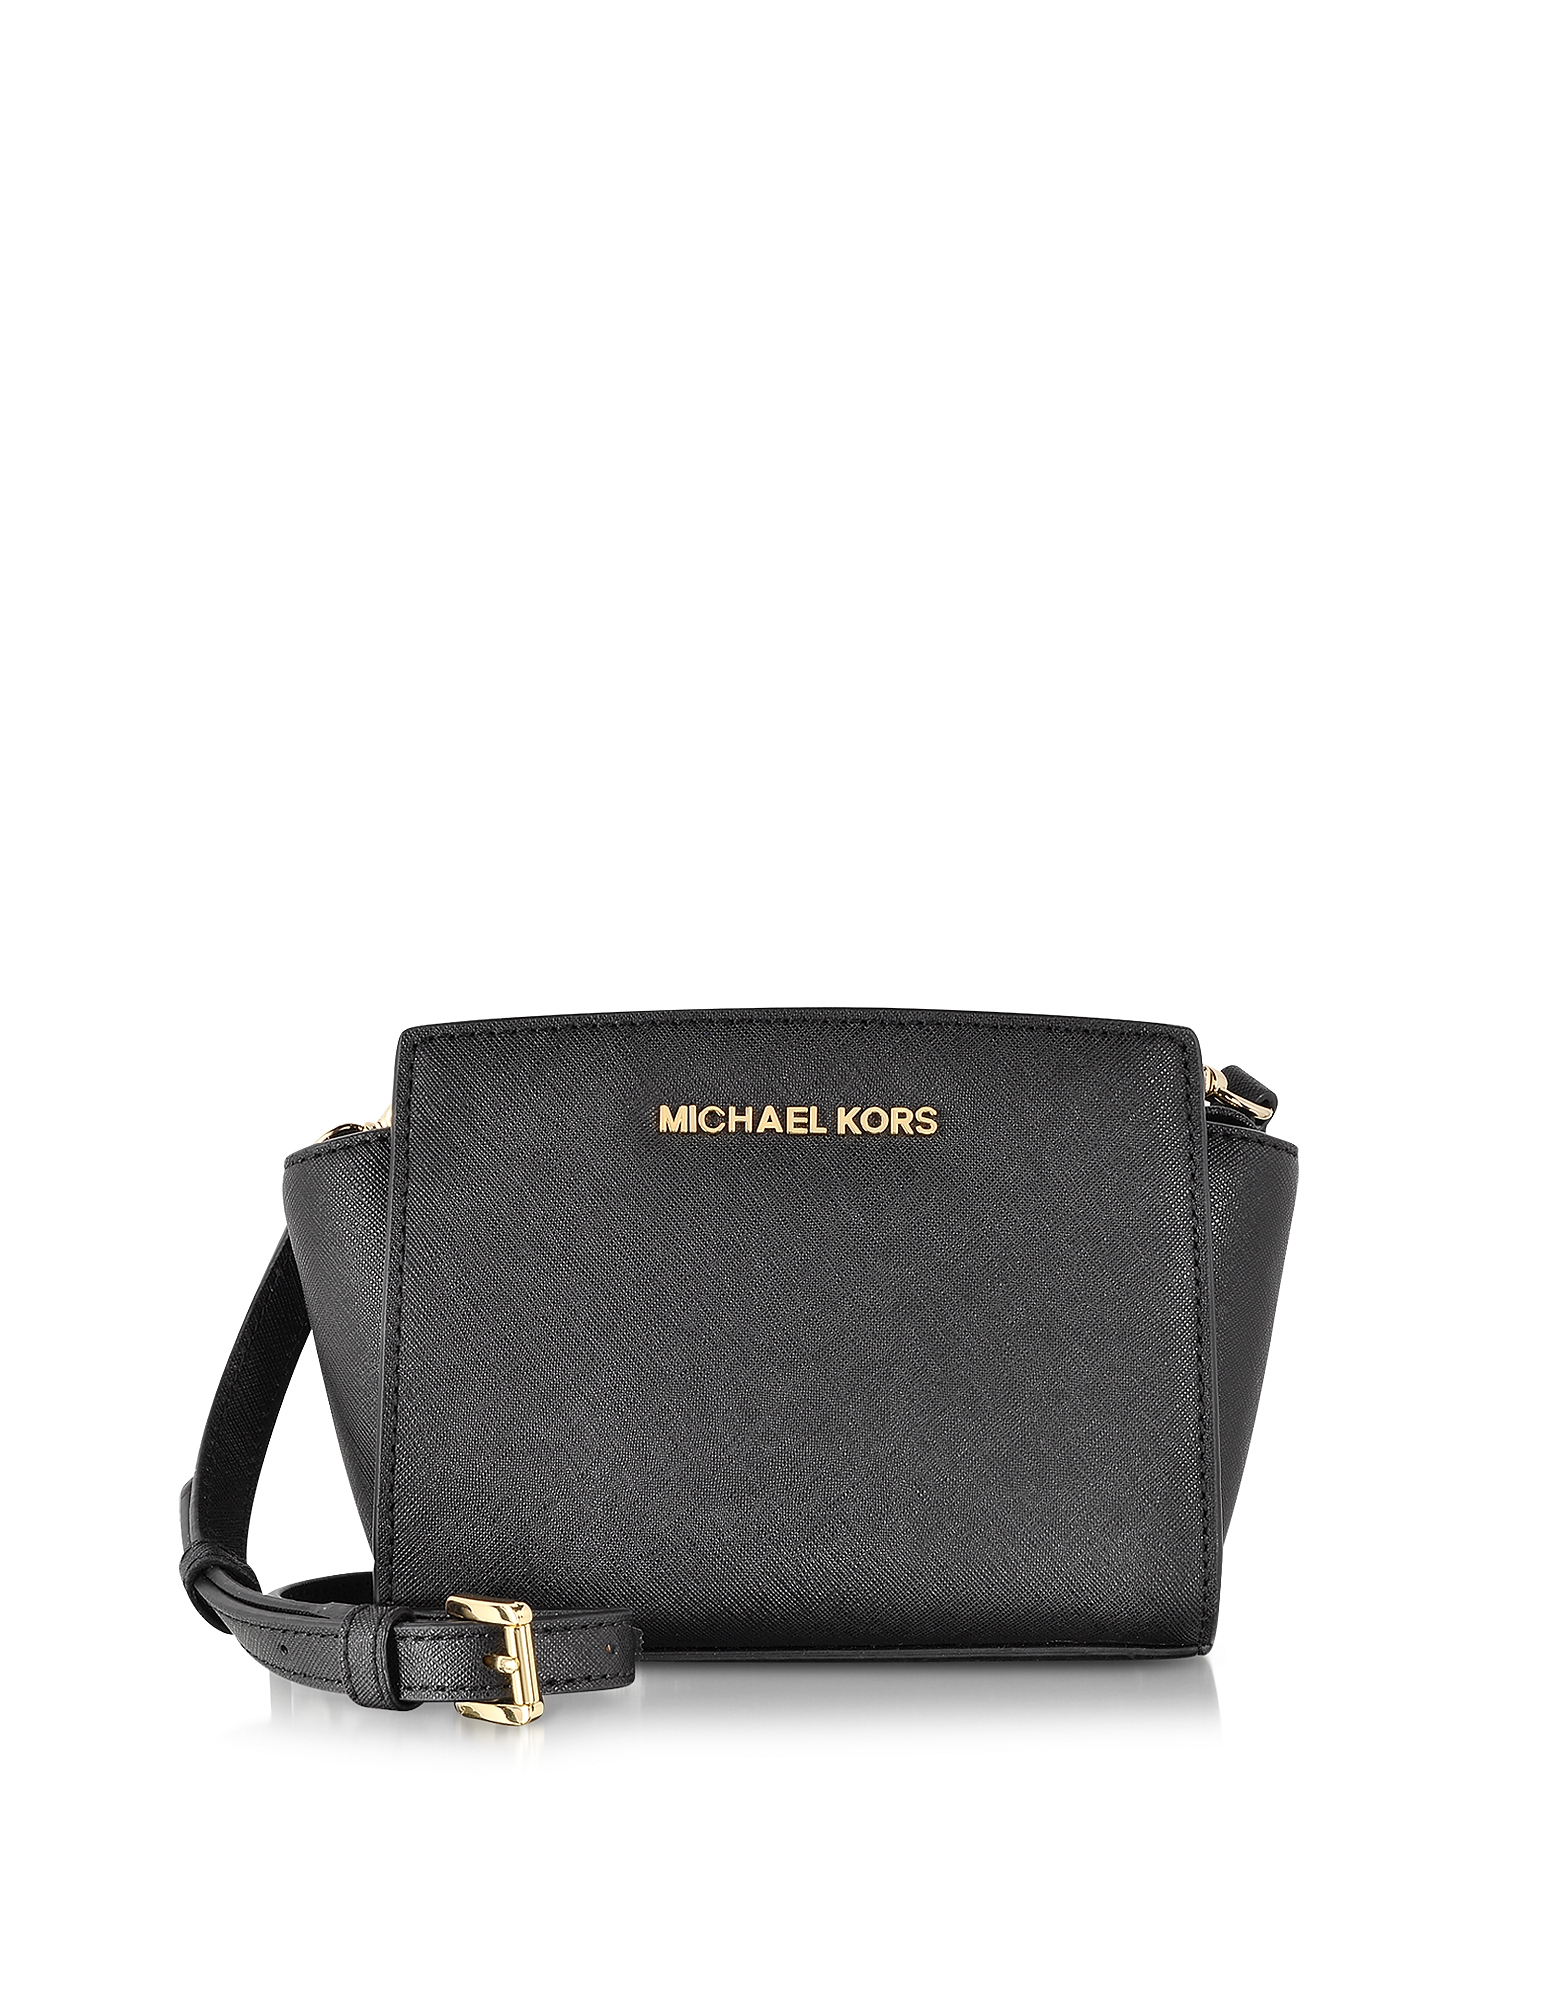 Michael Kors Handbags, Black Saffiano Leather Selma Mini Messenger Bag